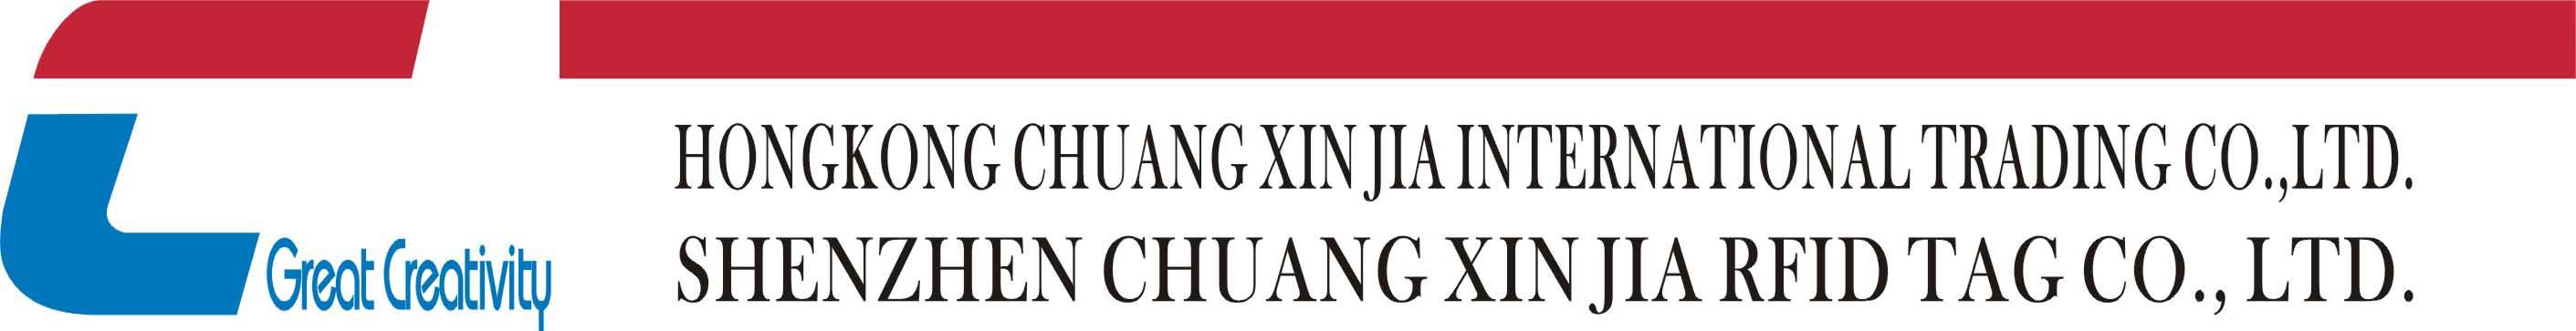 Shenzhen Chuangxinjia RFID tag Co., LTD logo